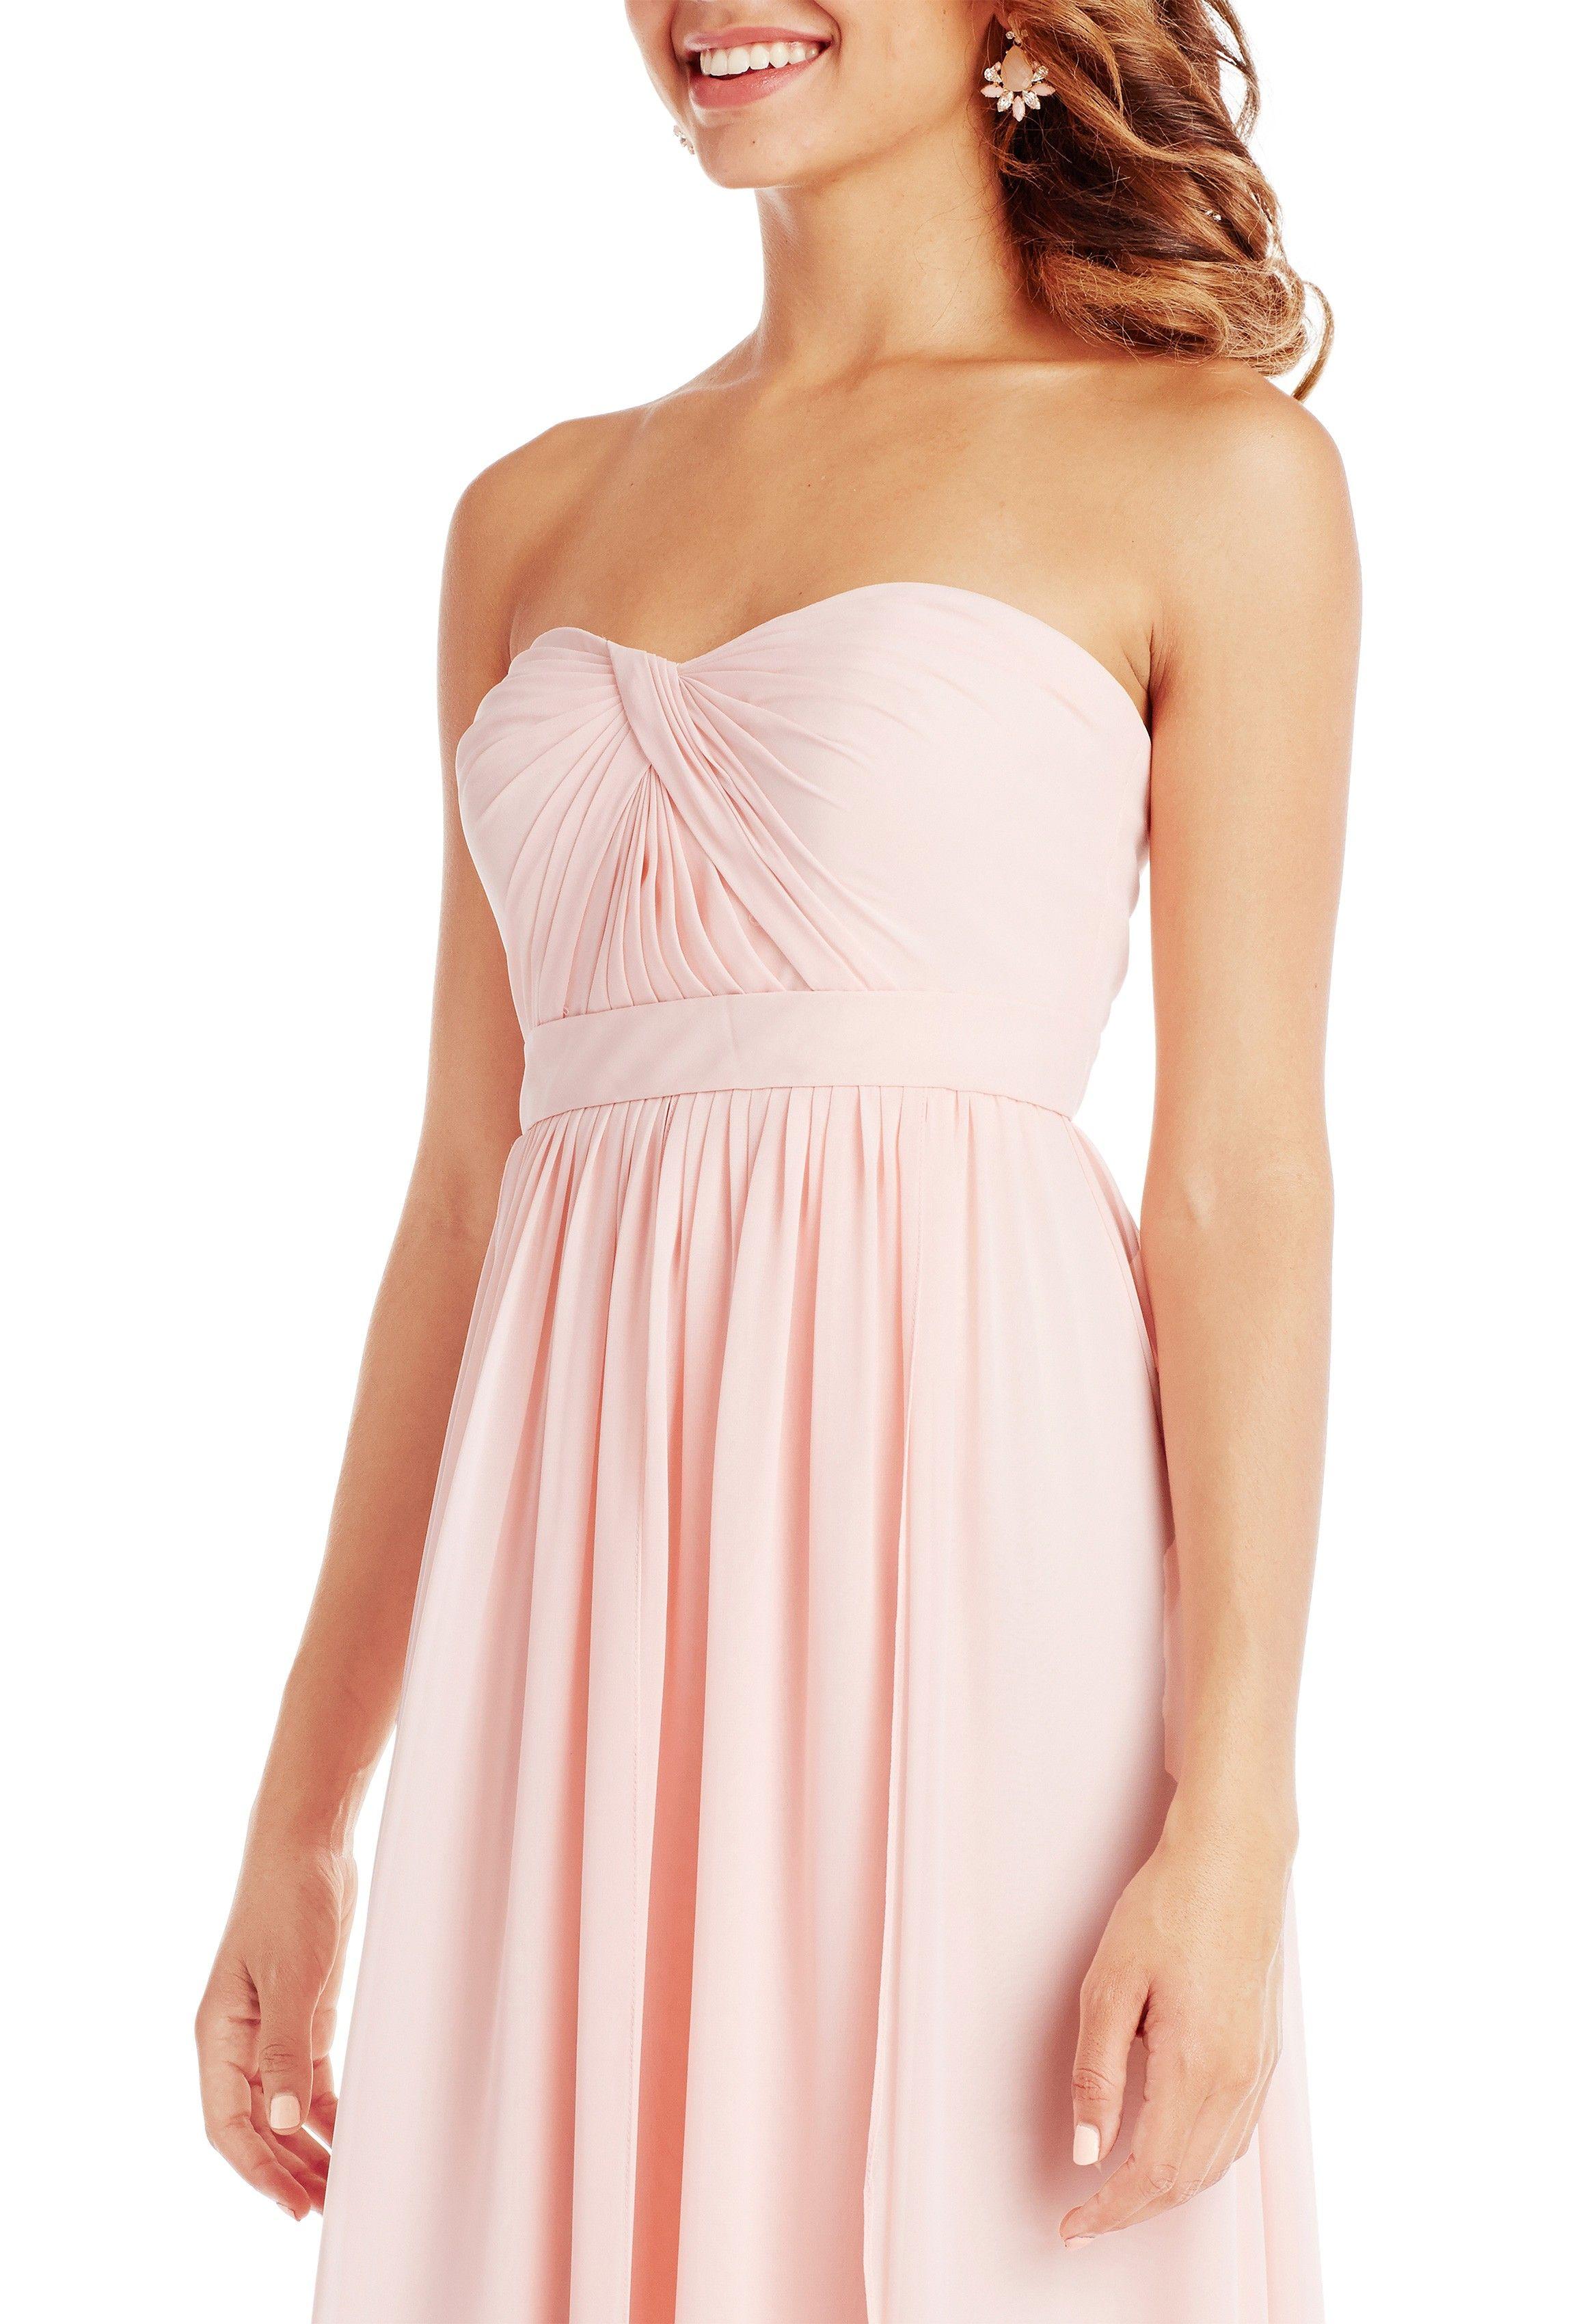 Jenny Yoo Aidan | Dusty blue, Wedding bridesmaid dresses and Wedding